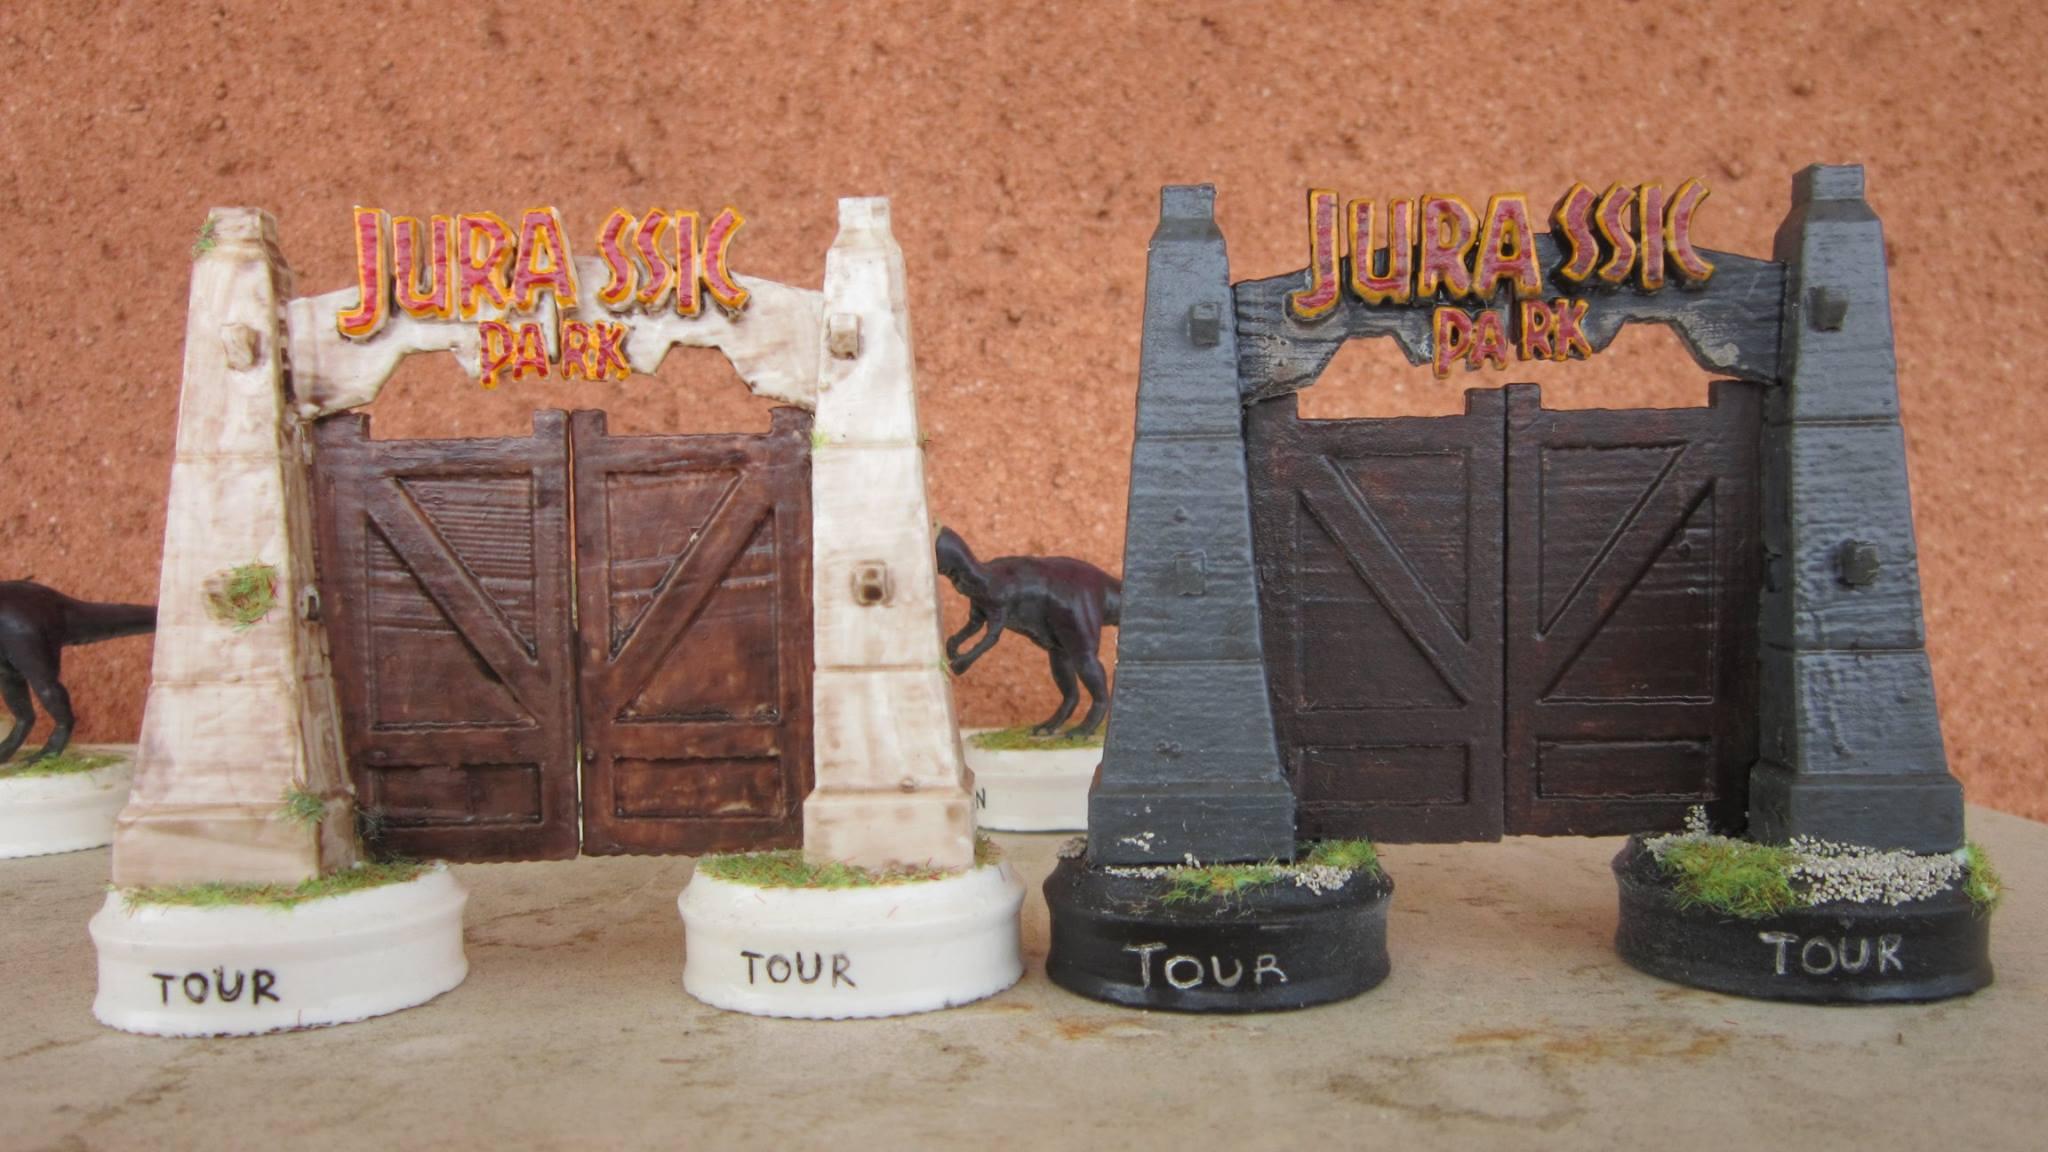 Jurassic Park 3d Printed Chess Set Pits T Rex Against